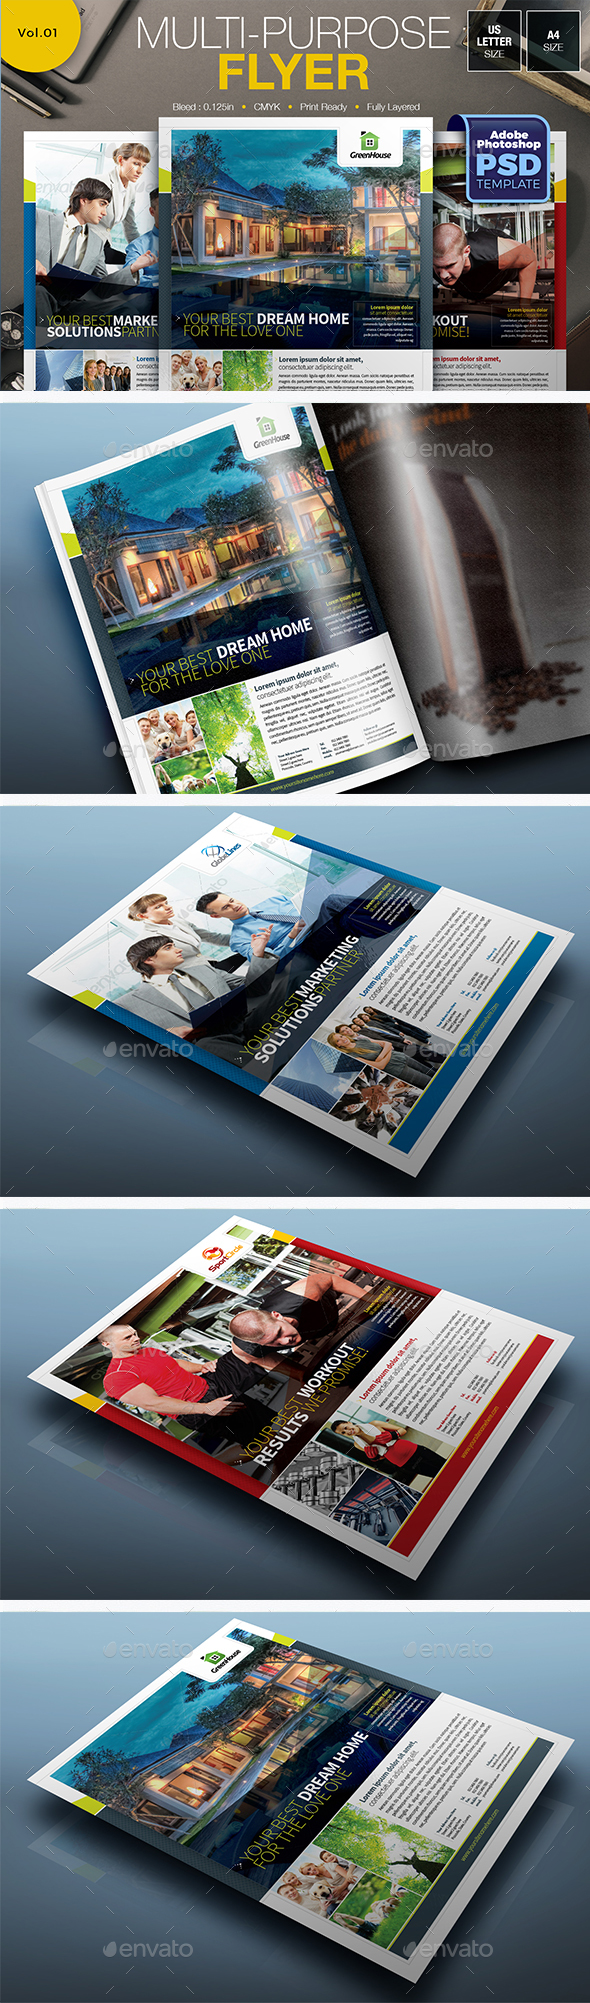 Multipurpose Flyer Vol.01 - Miscellaneous Events